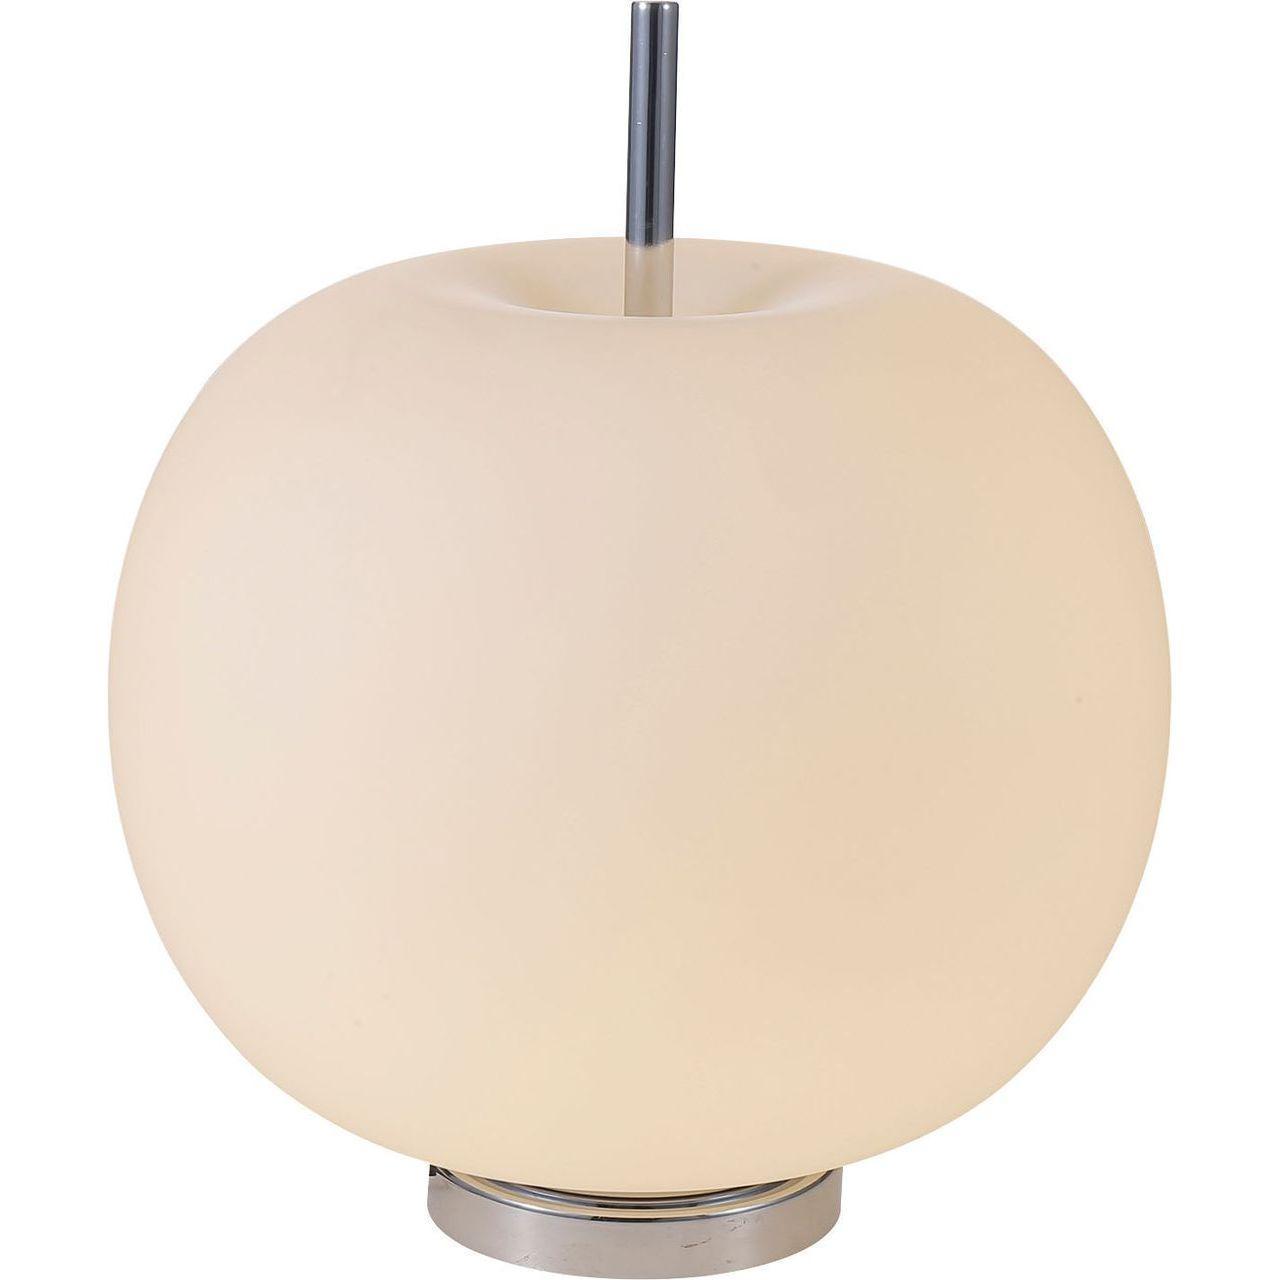 Настольная лампа Spot Light Apple 9962102 lml 0460 60w 5400lm 6000k 12 cree led white light 7 spot flood work light black 9 80v